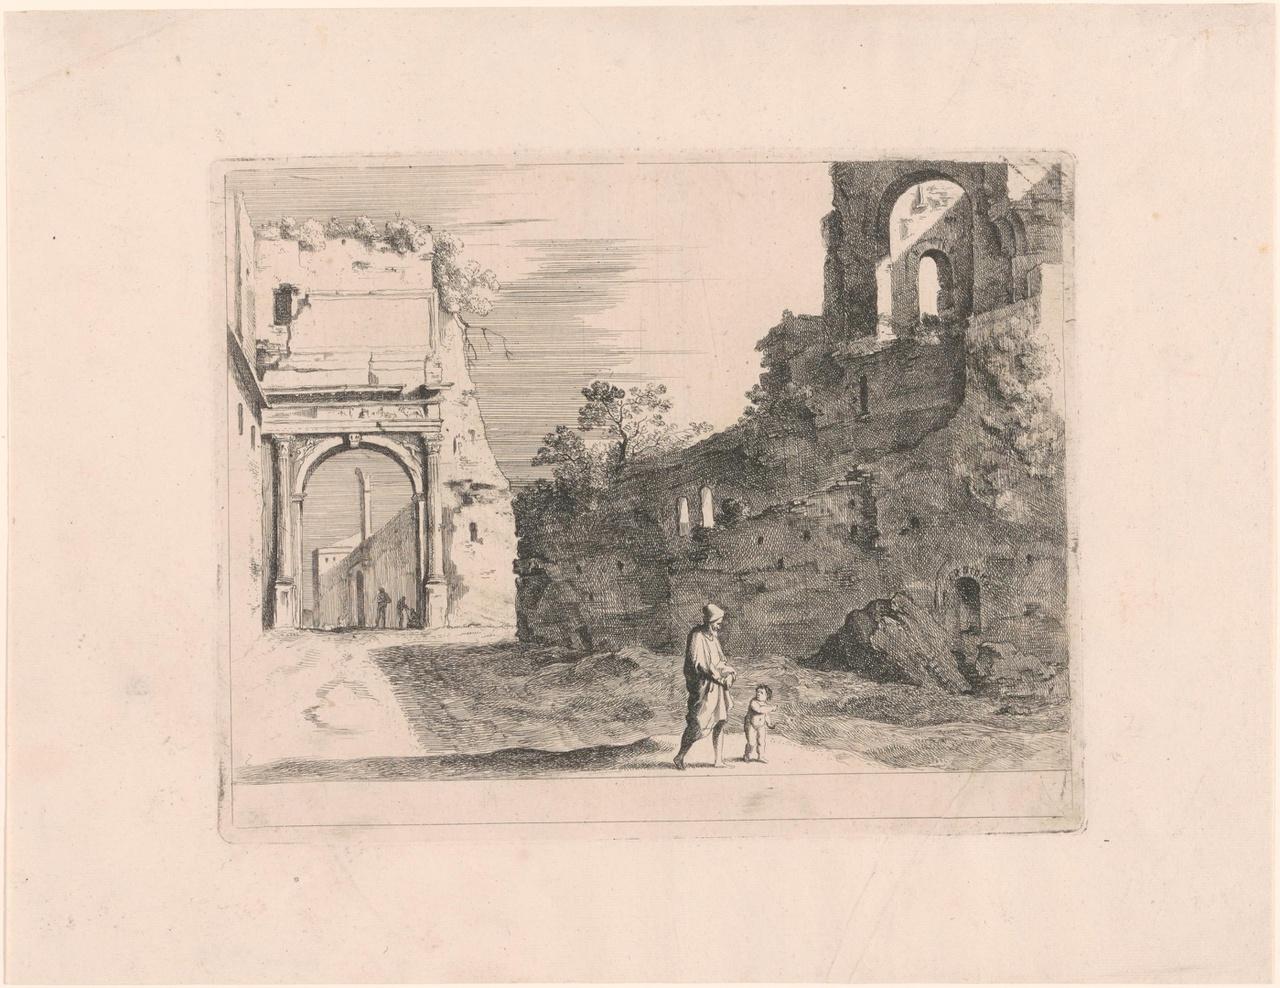 Ruïnes van de Titusboog in Rome